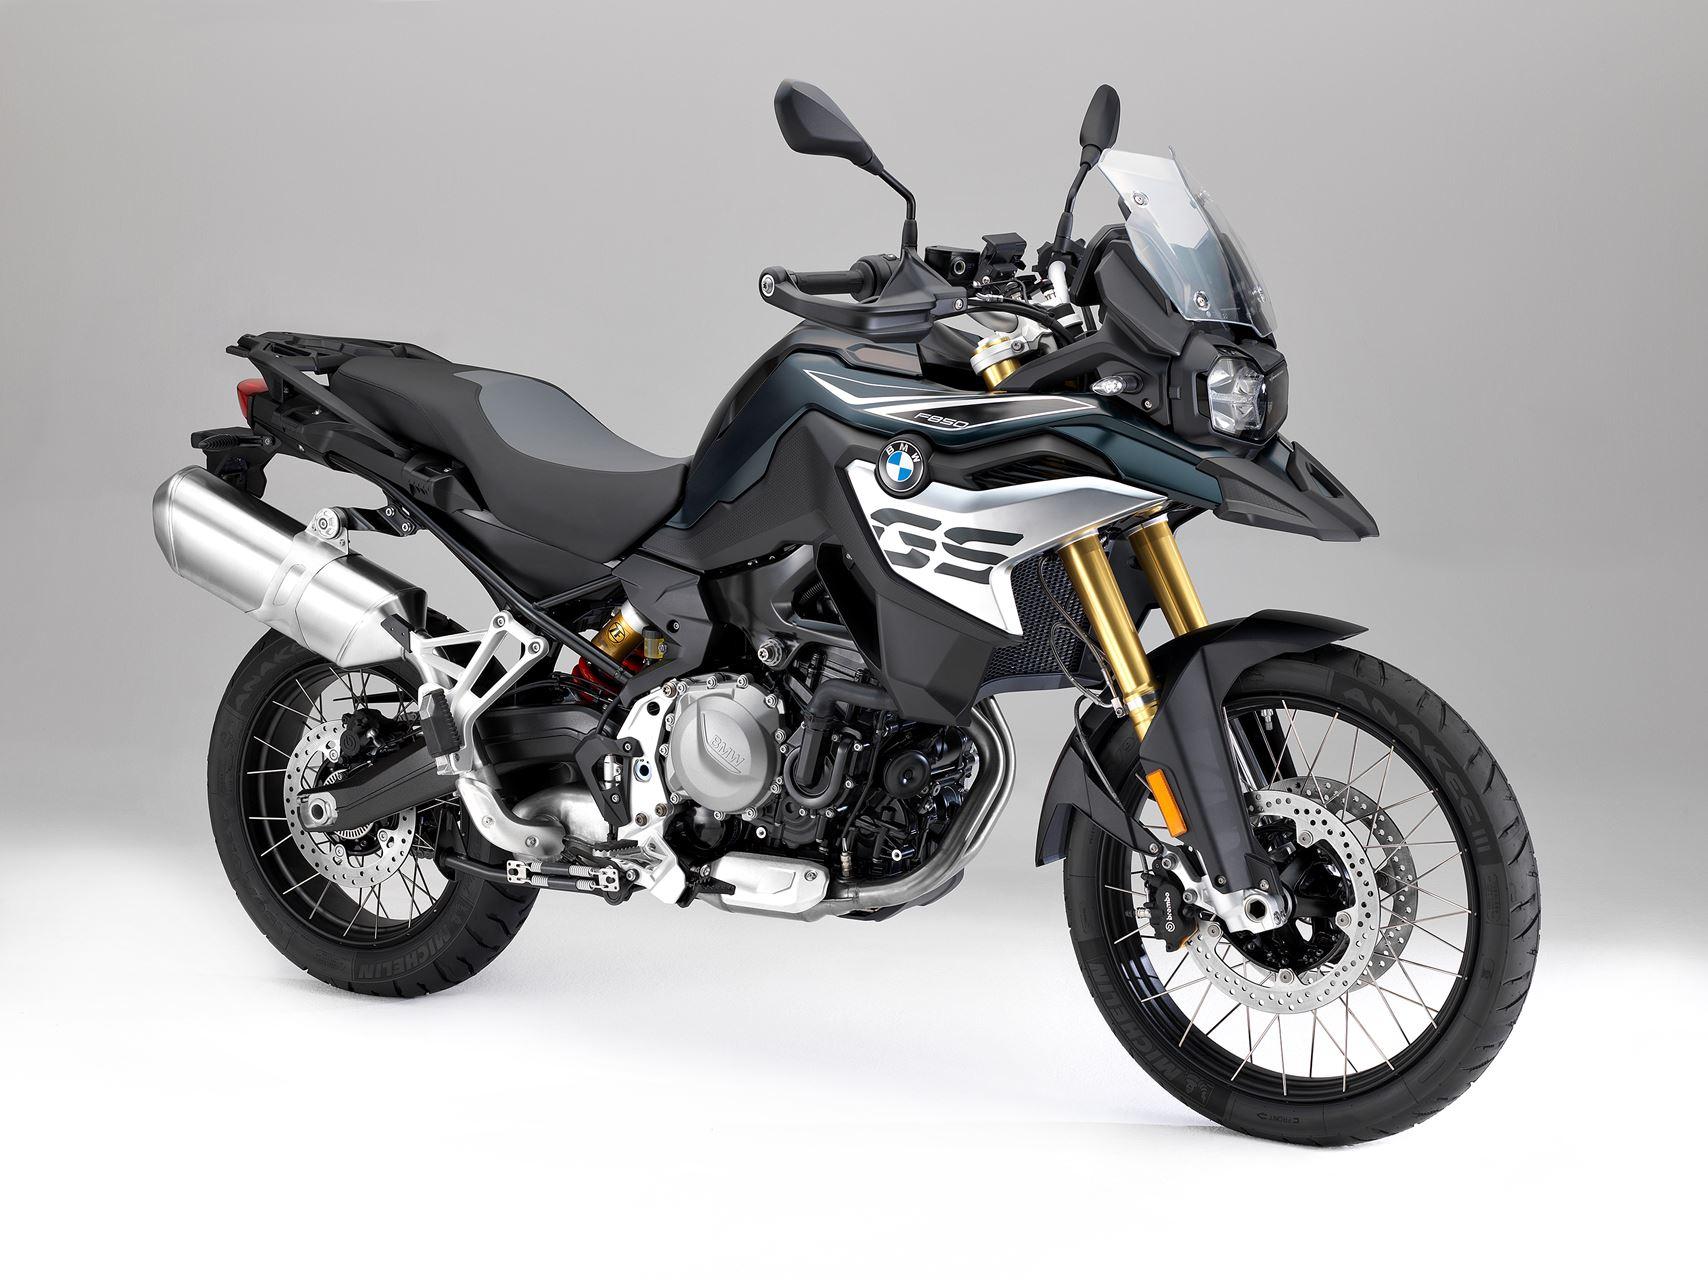 bmw f 850 gs moto adventure andar de moto. Black Bedroom Furniture Sets. Home Design Ideas